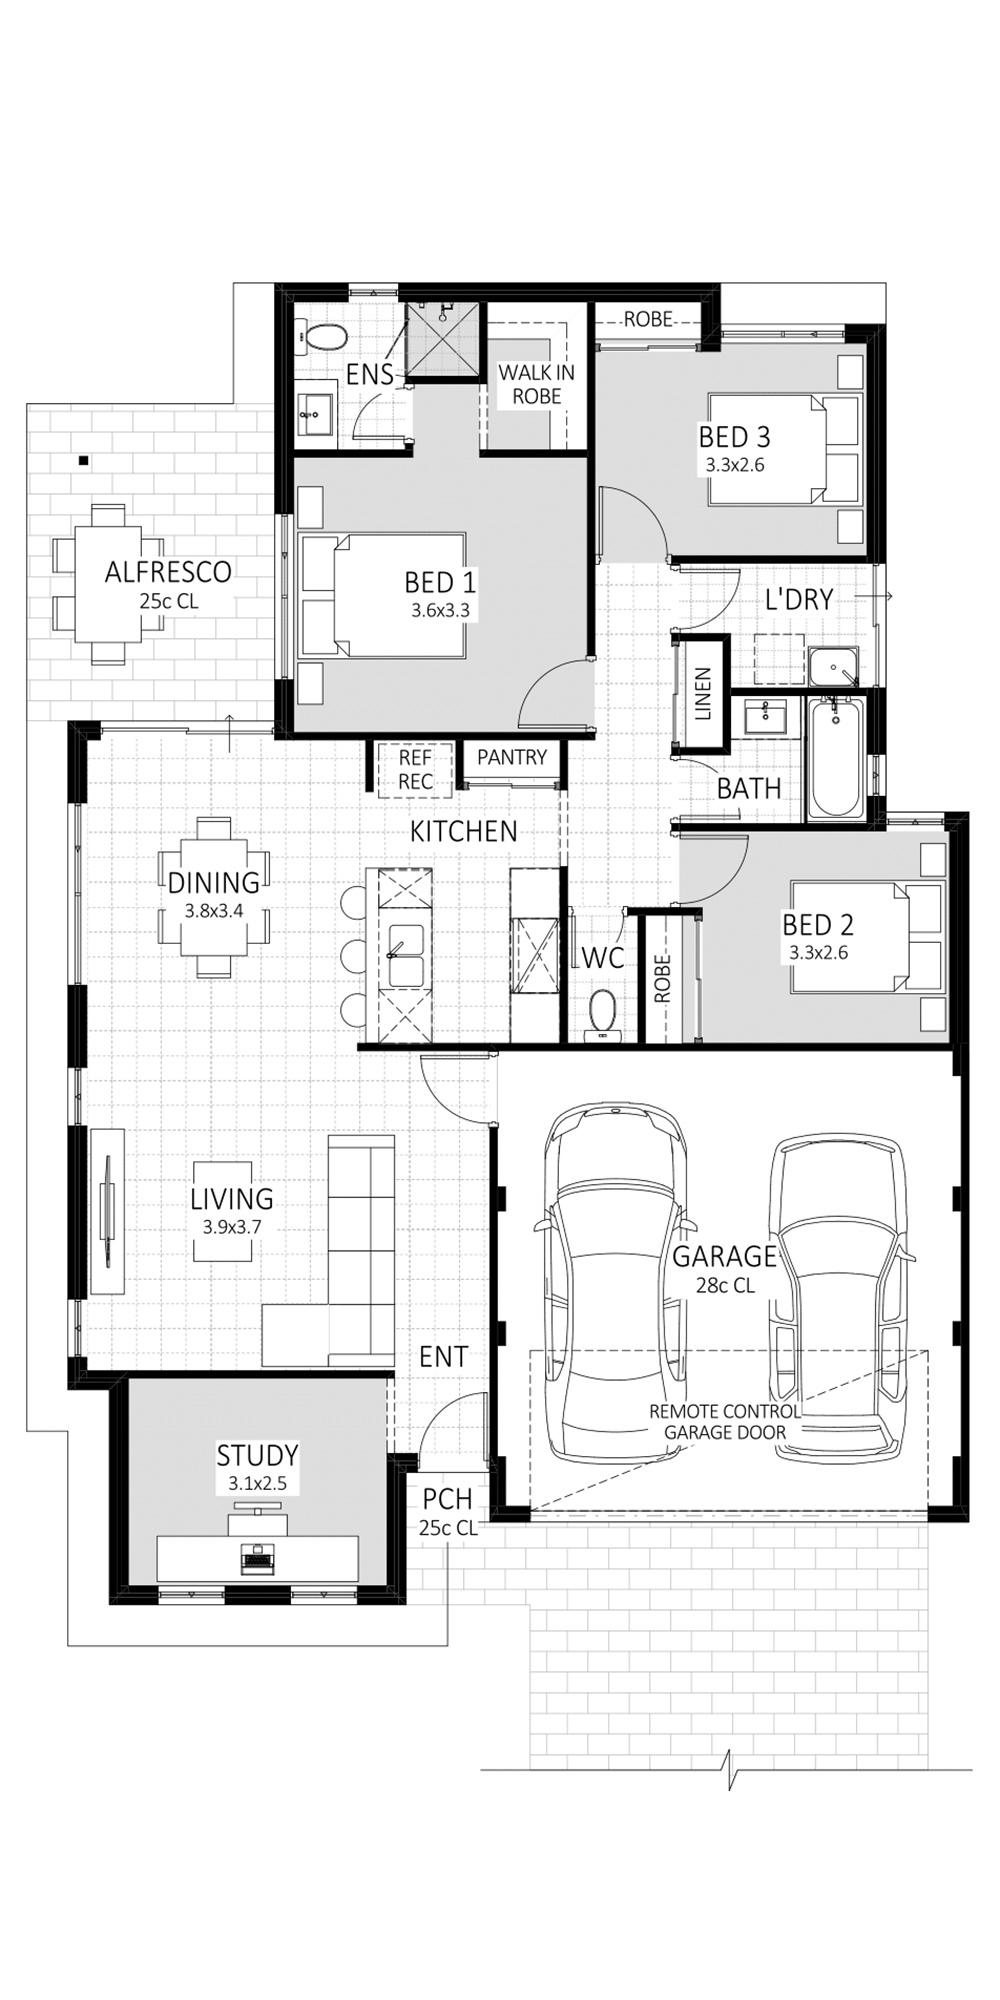 Aspire floorplan